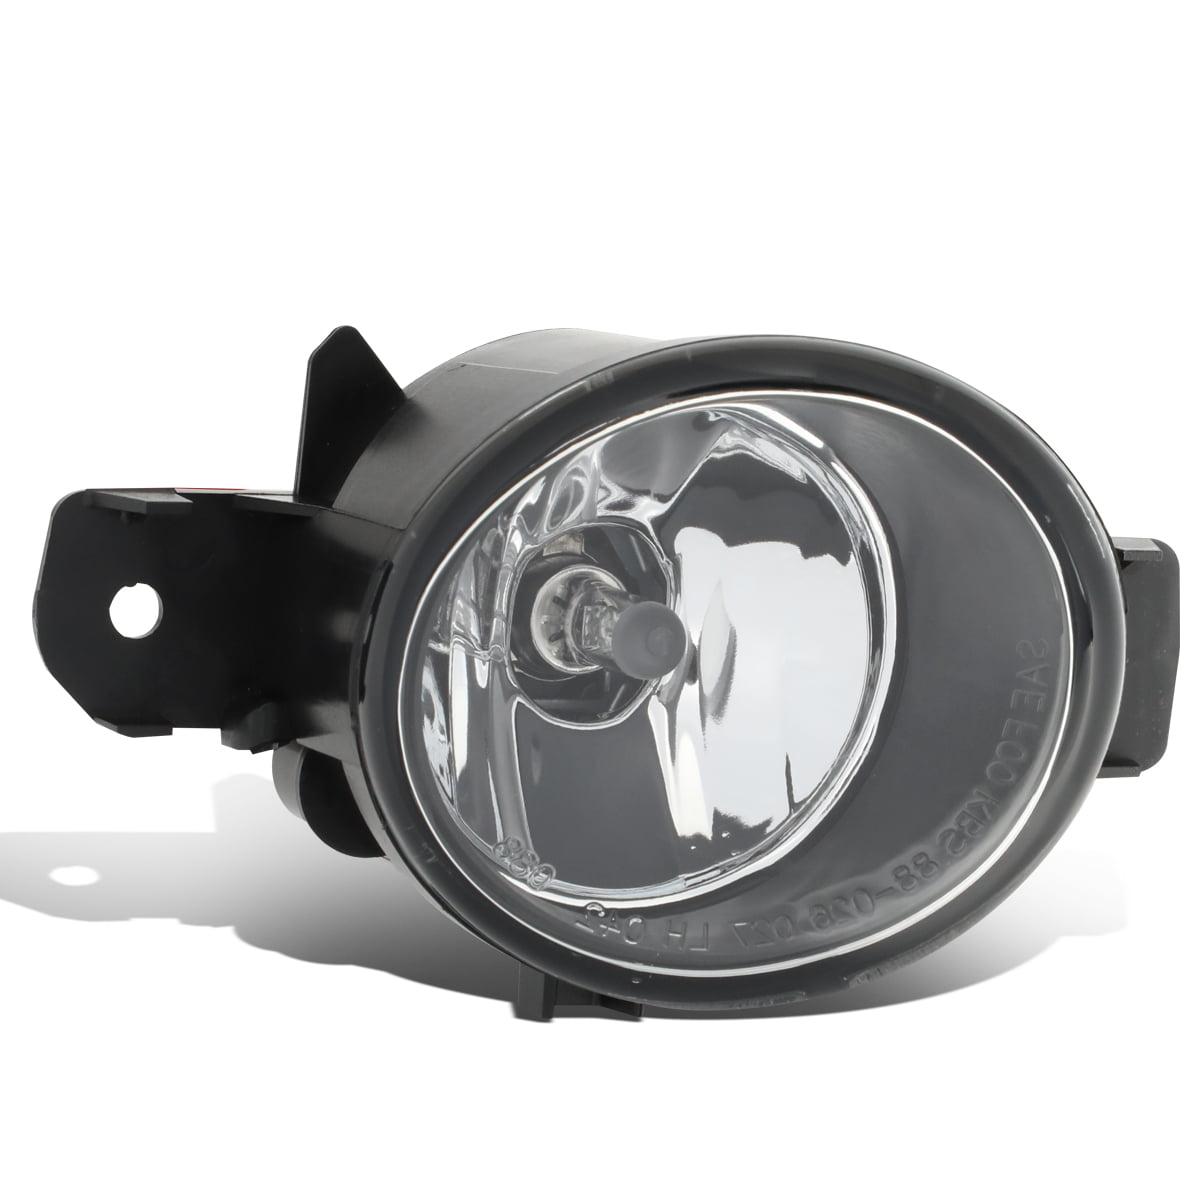 For 04-18 Nissan Sentra/Altima/Infiniti G37/QX60 Right Side Fog Light/Lamp Maxima/Murano/Pathfinder 05 06 07 08 09 10 11 12 13 14 15 16 17